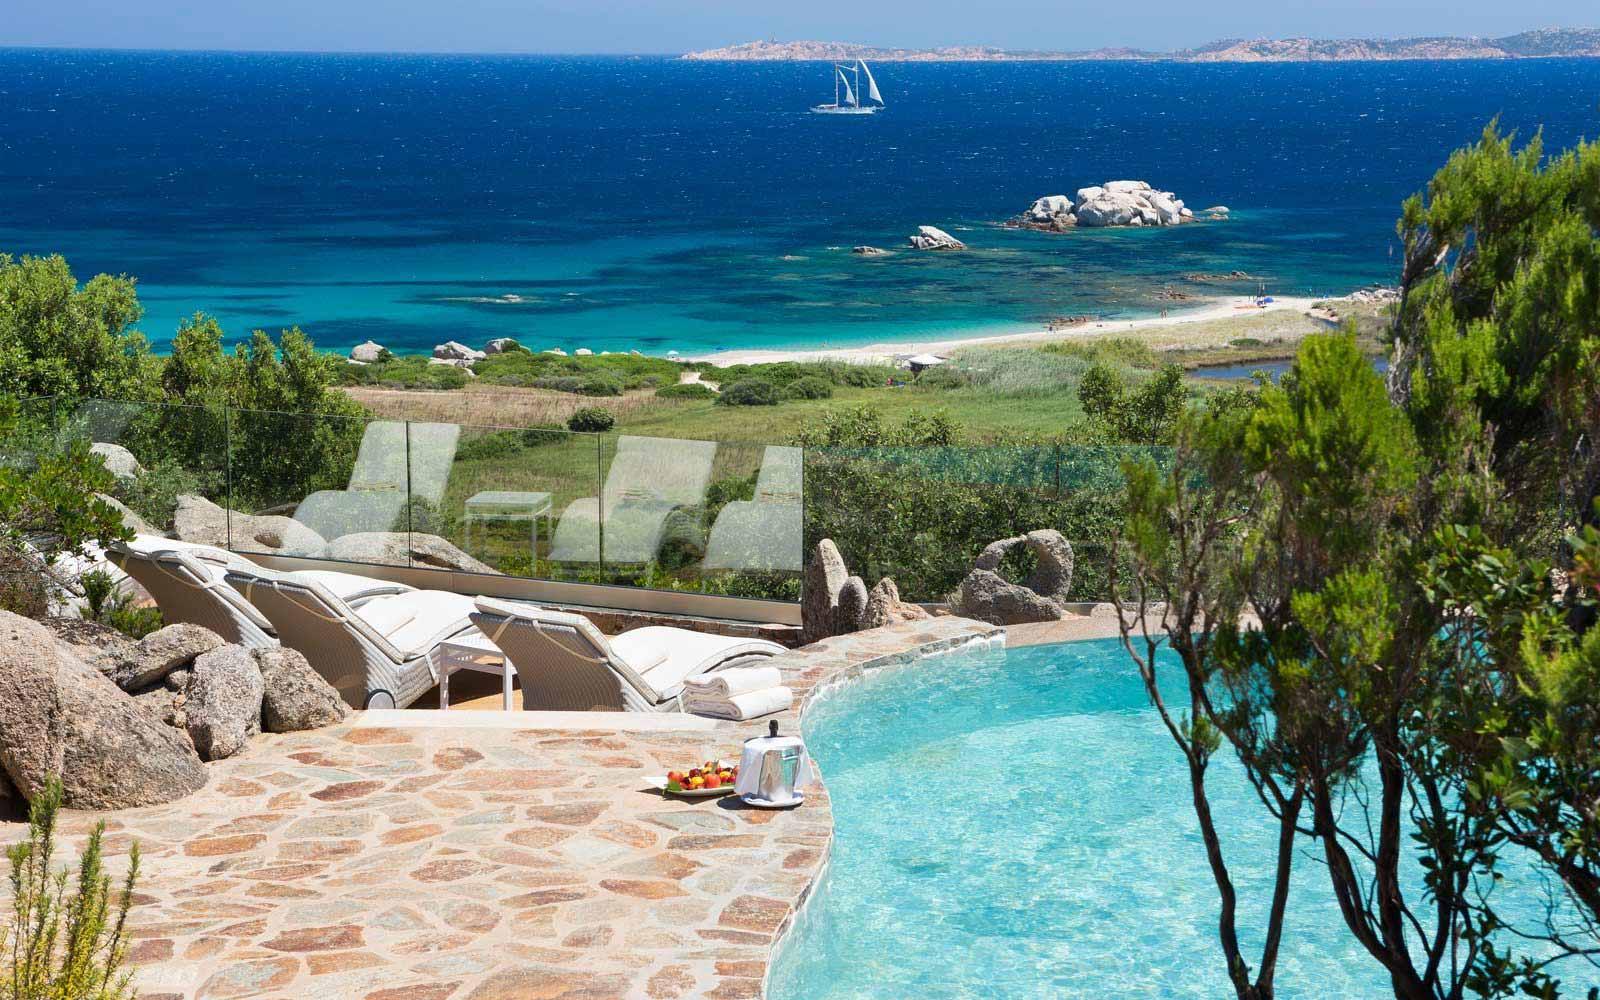 Suite Arcipelago private pool at Hotel Valle Dell'Erica - La Licciola